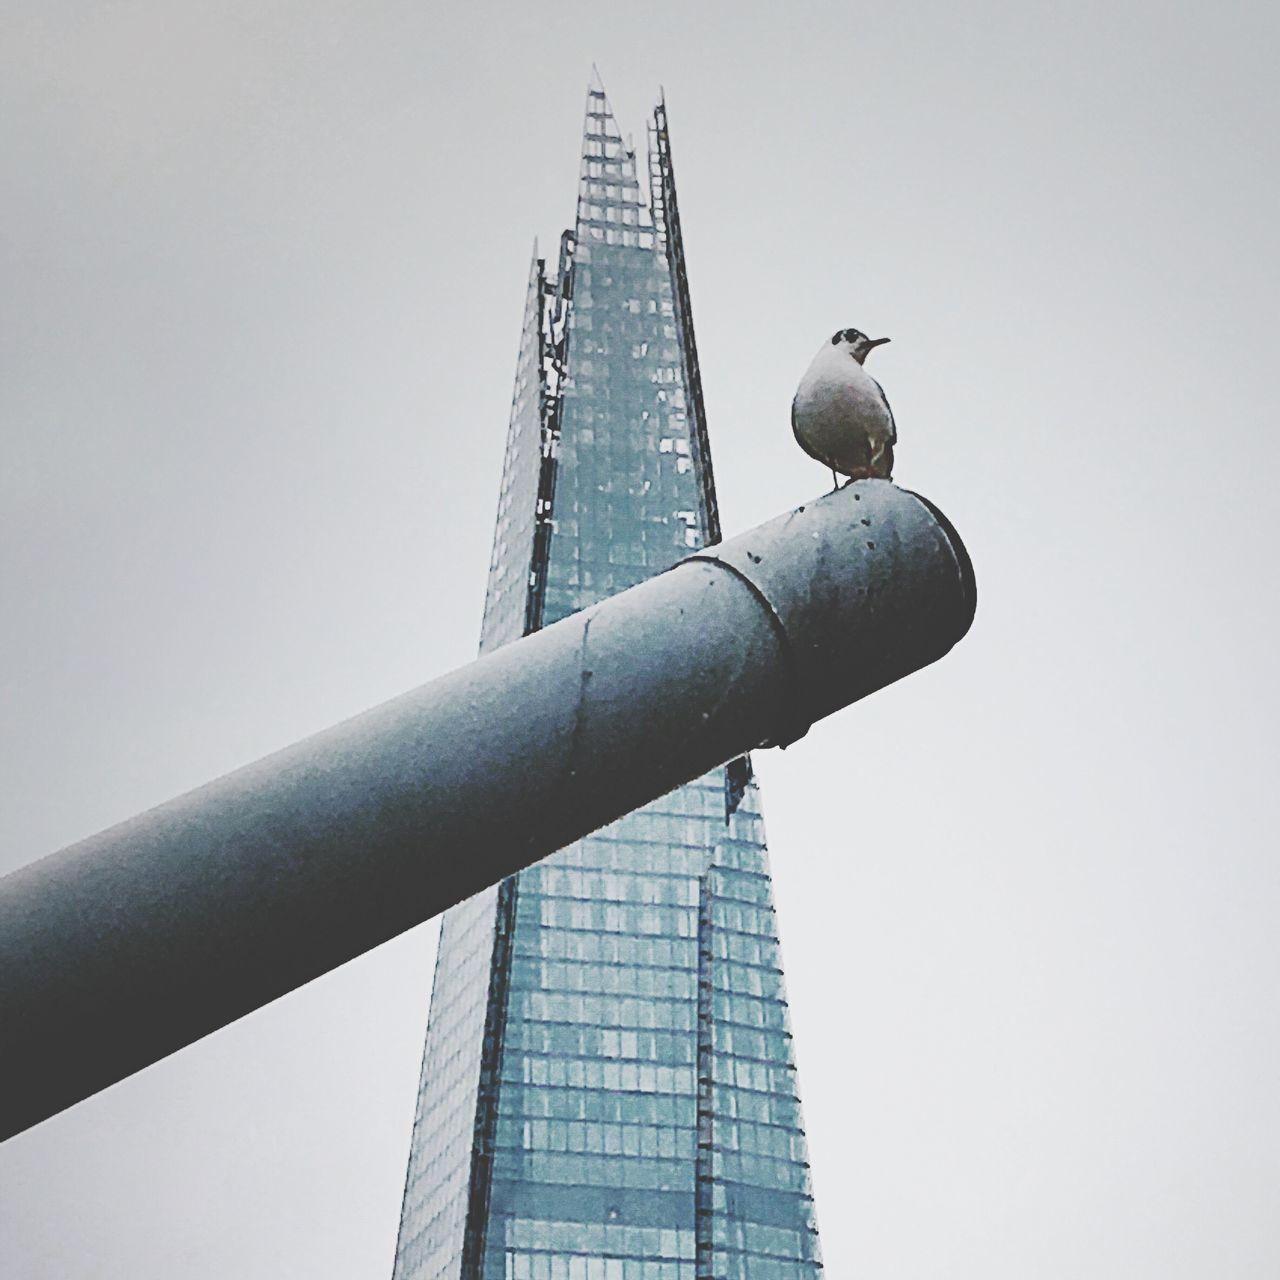 Past, present, peace. Tower Building Exterior City First Eyeem Photo The Architect - 2017 EyeEm Awards EyeEmNewHere